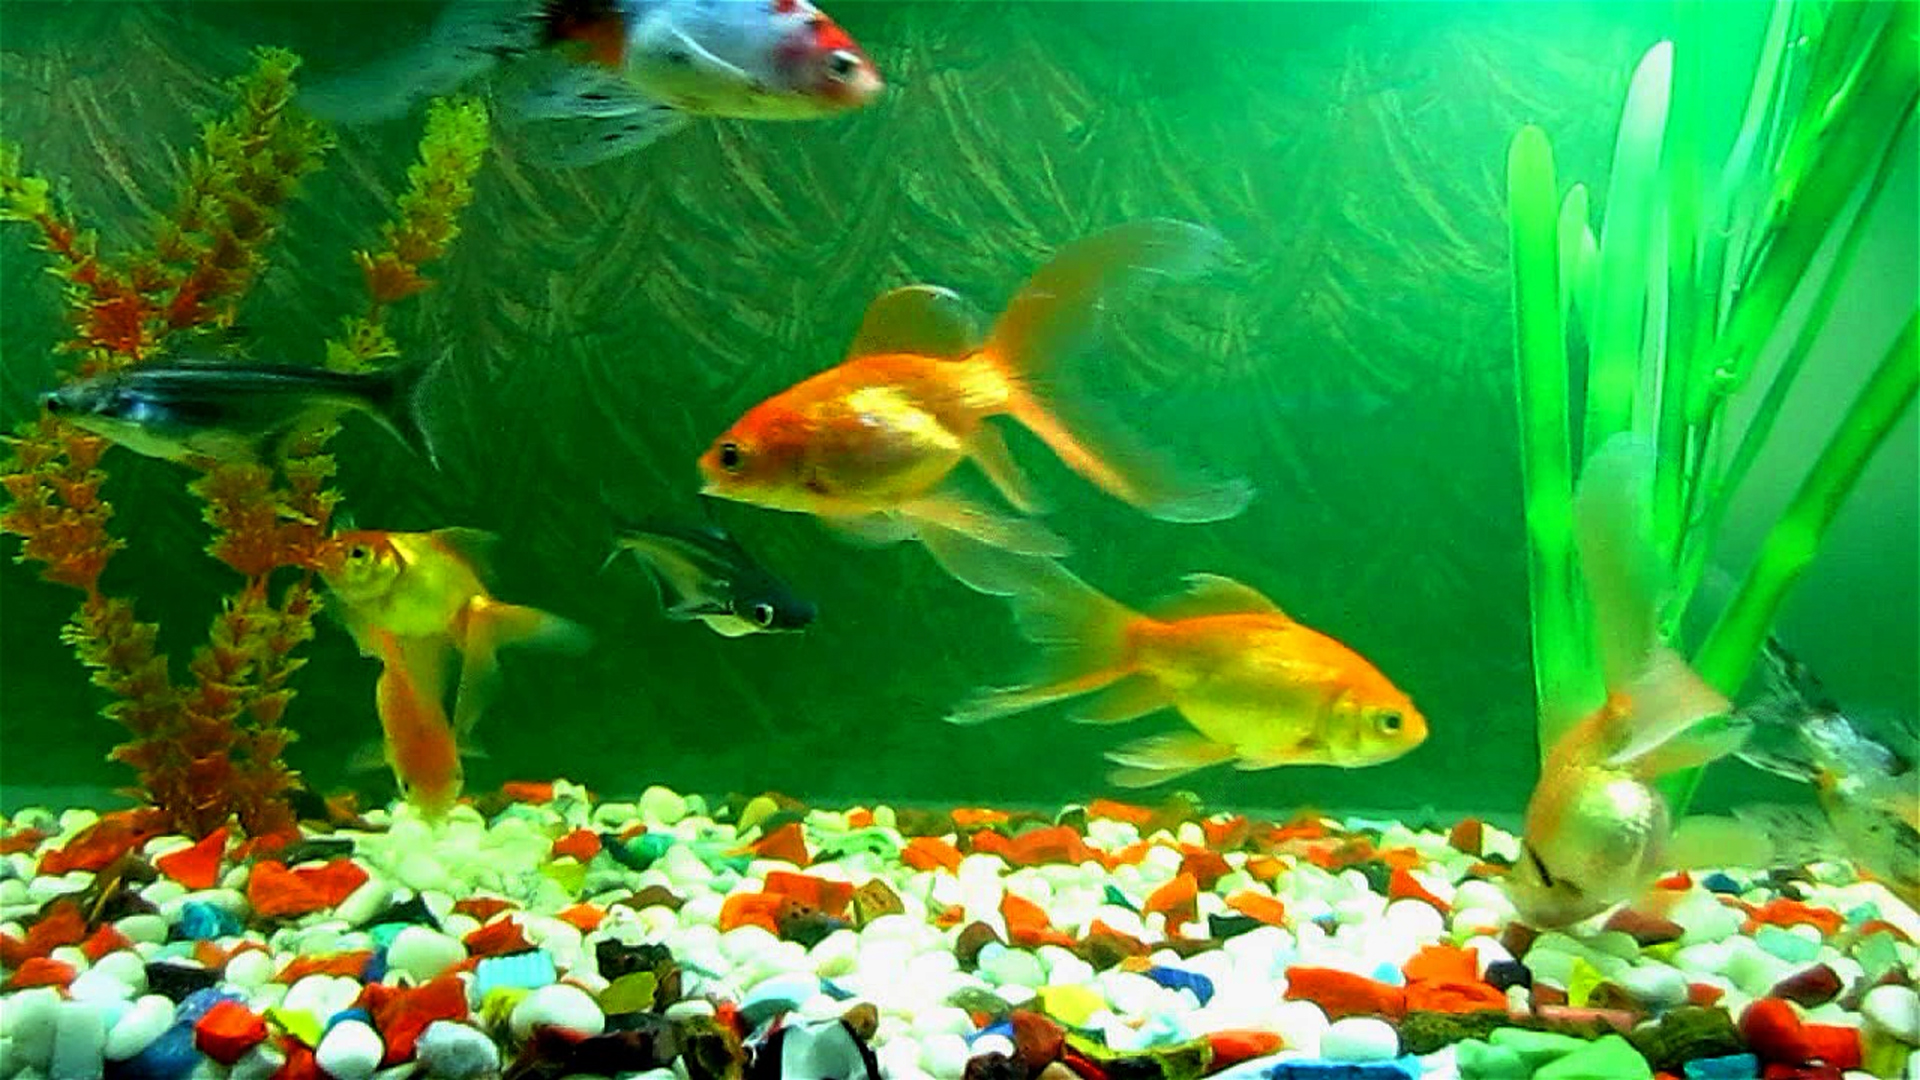 fish wallpapers hd | pixelstalk